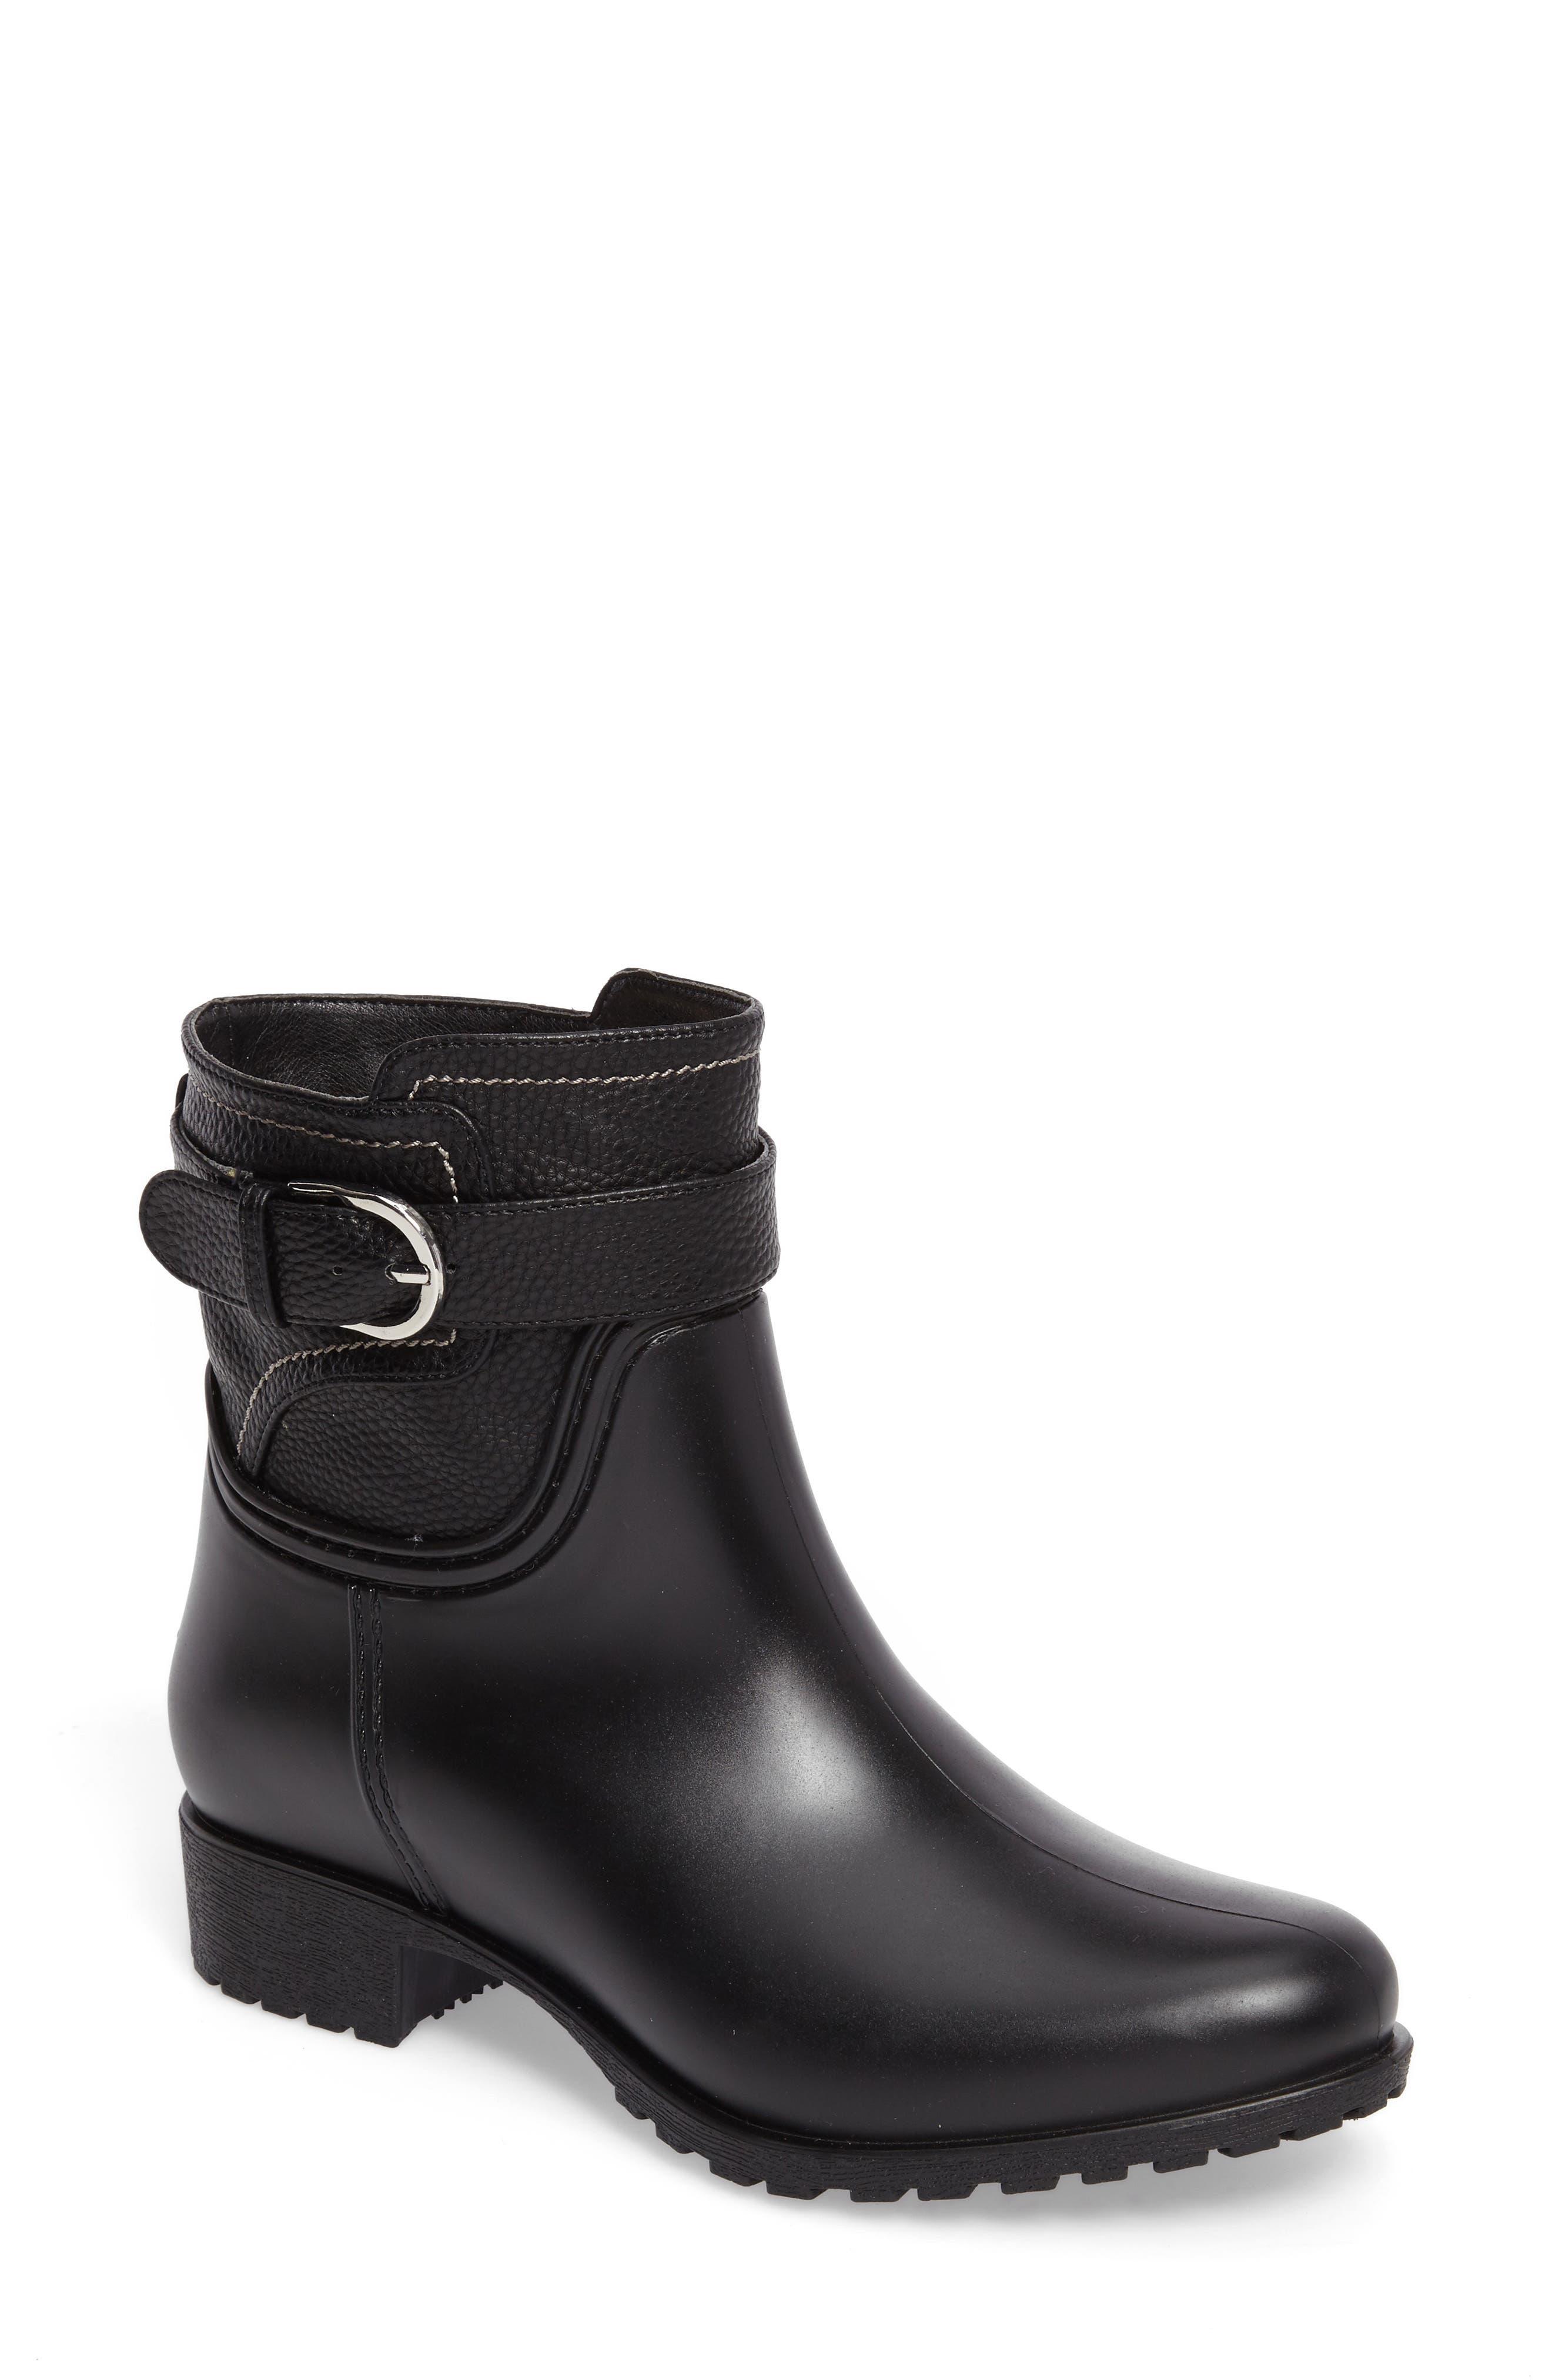 Main Image - däv Bowie Faux Water Resistant Mid Boot (Women)